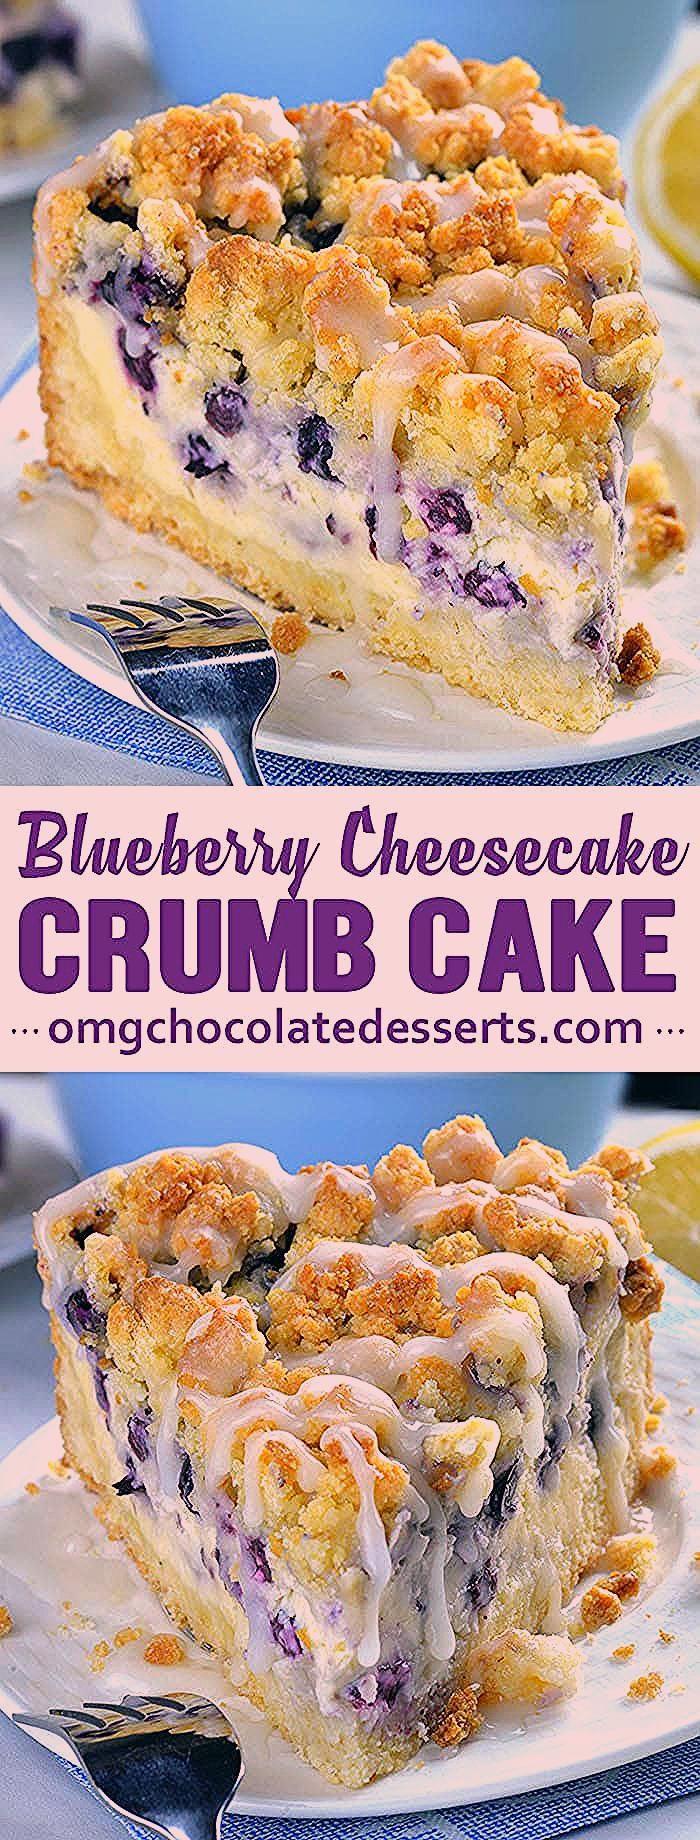 Photo of Blueberry Cheesecake Crumb Cake